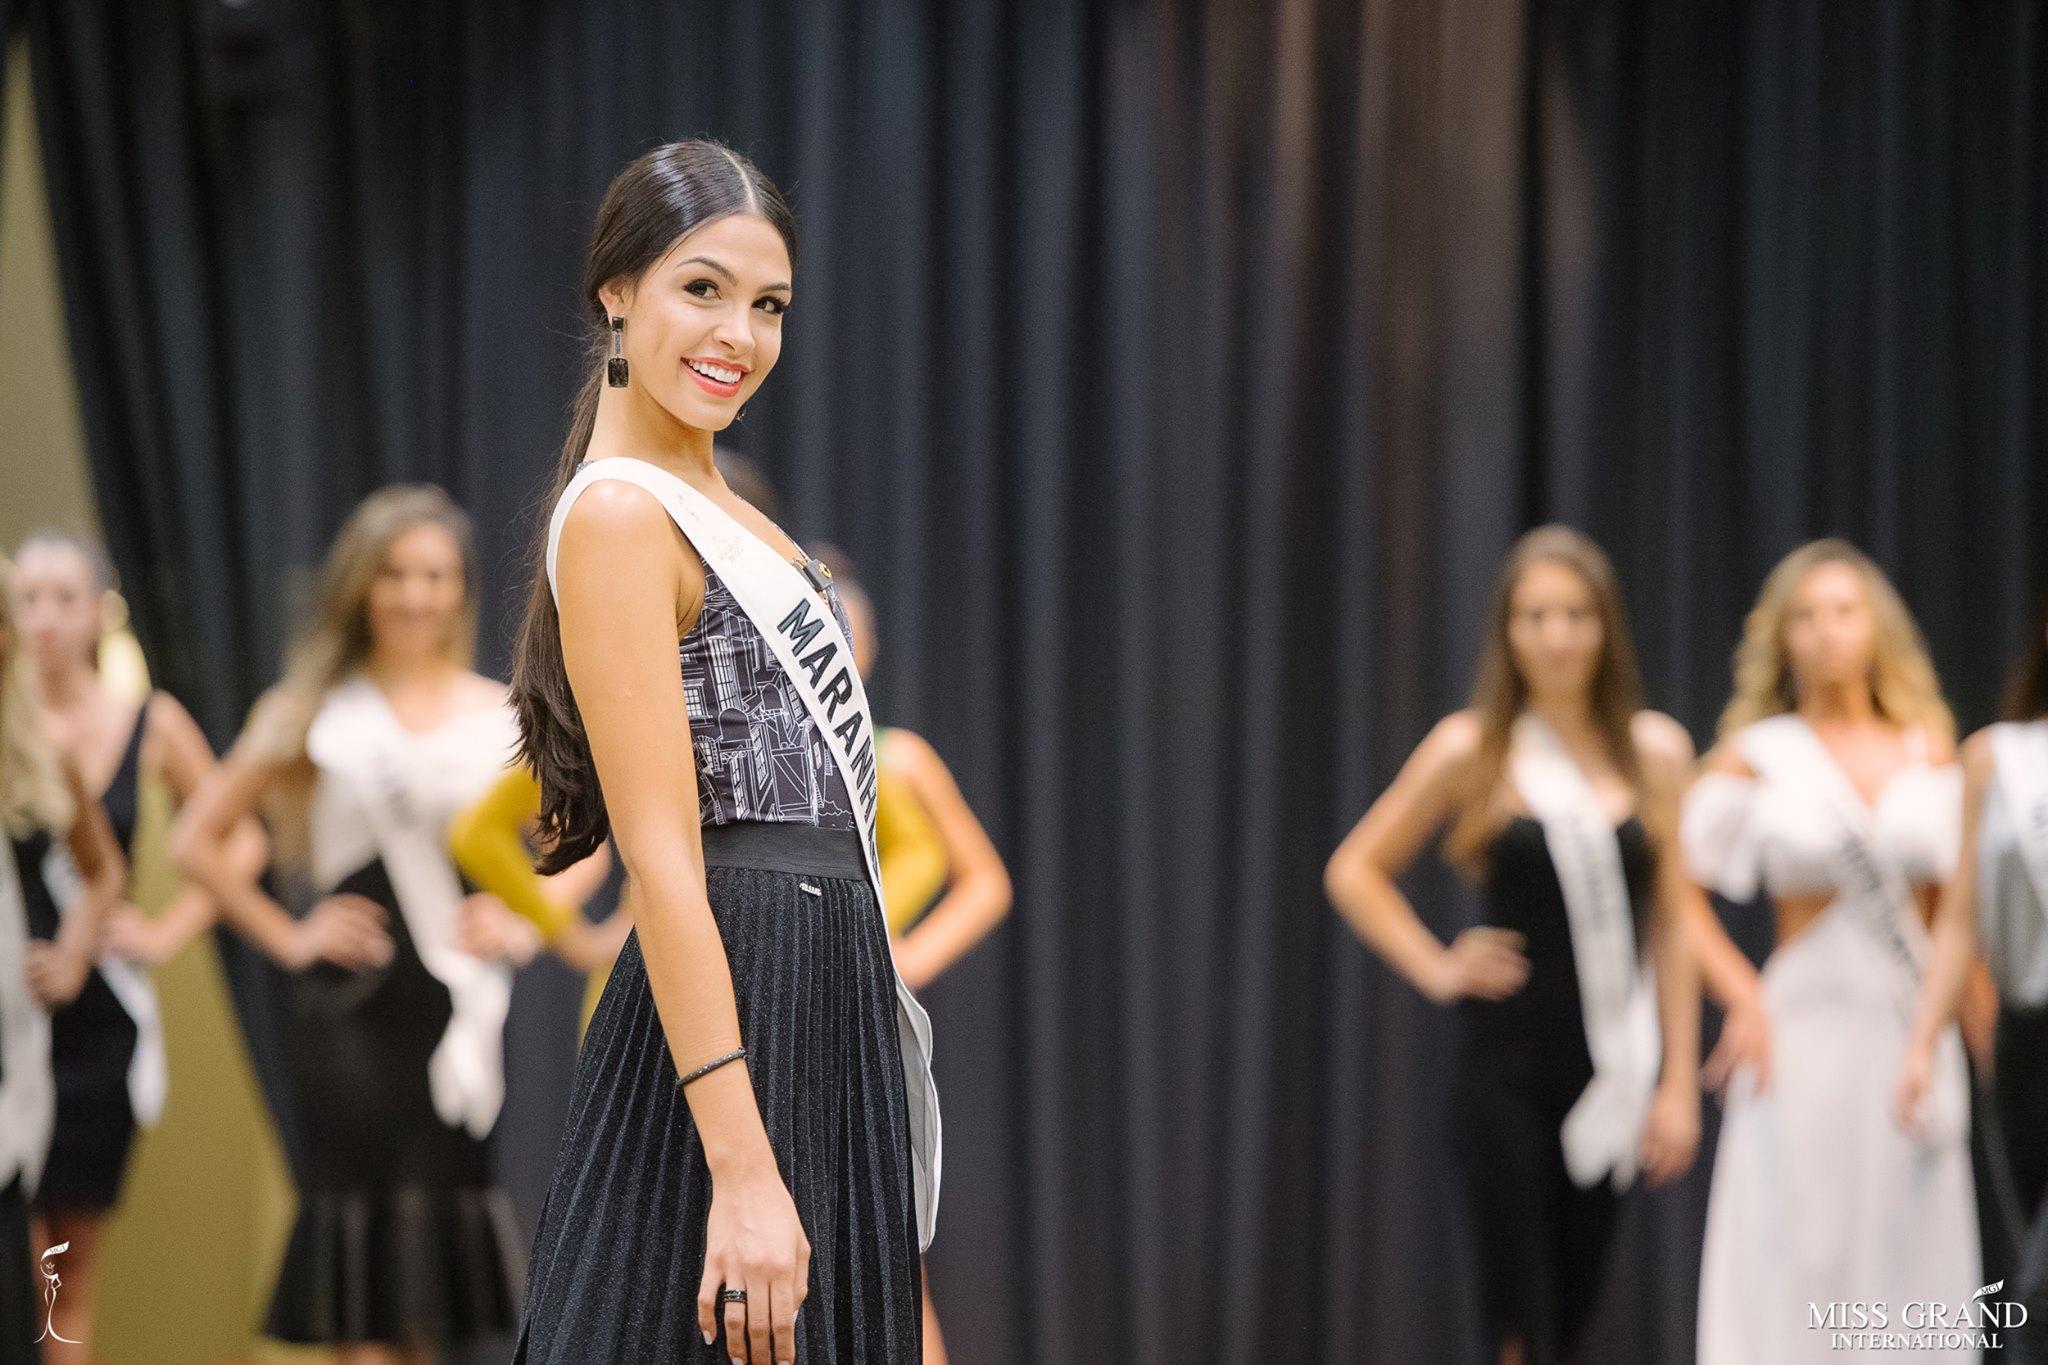 amanda brenner, miss hispanoamericana brasil 2019/top 2 de miss grand brasil 2019/top 2 de rainha da pecuaria internacional 2018. - Página 3 Axq5ps10